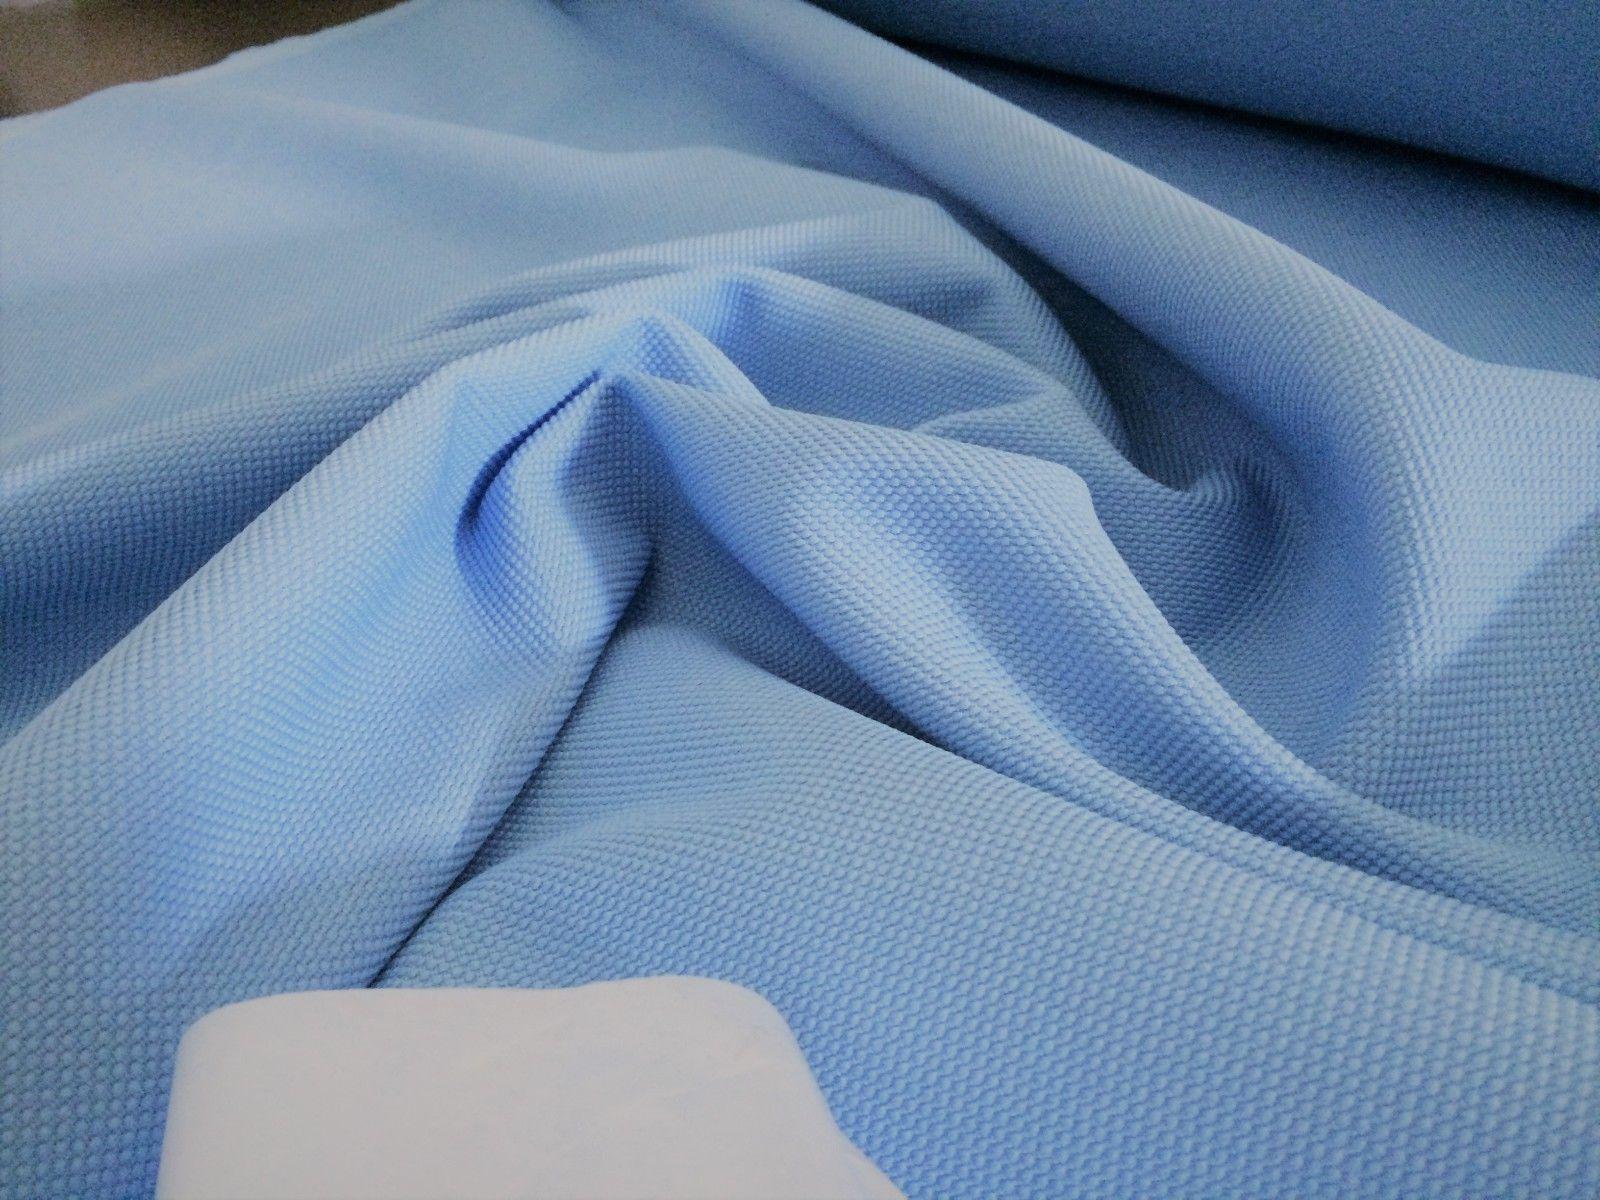 10 Meter Polsterstoff Möbelstoff Webstoff Bezug Meterware fleckschutz baby blau